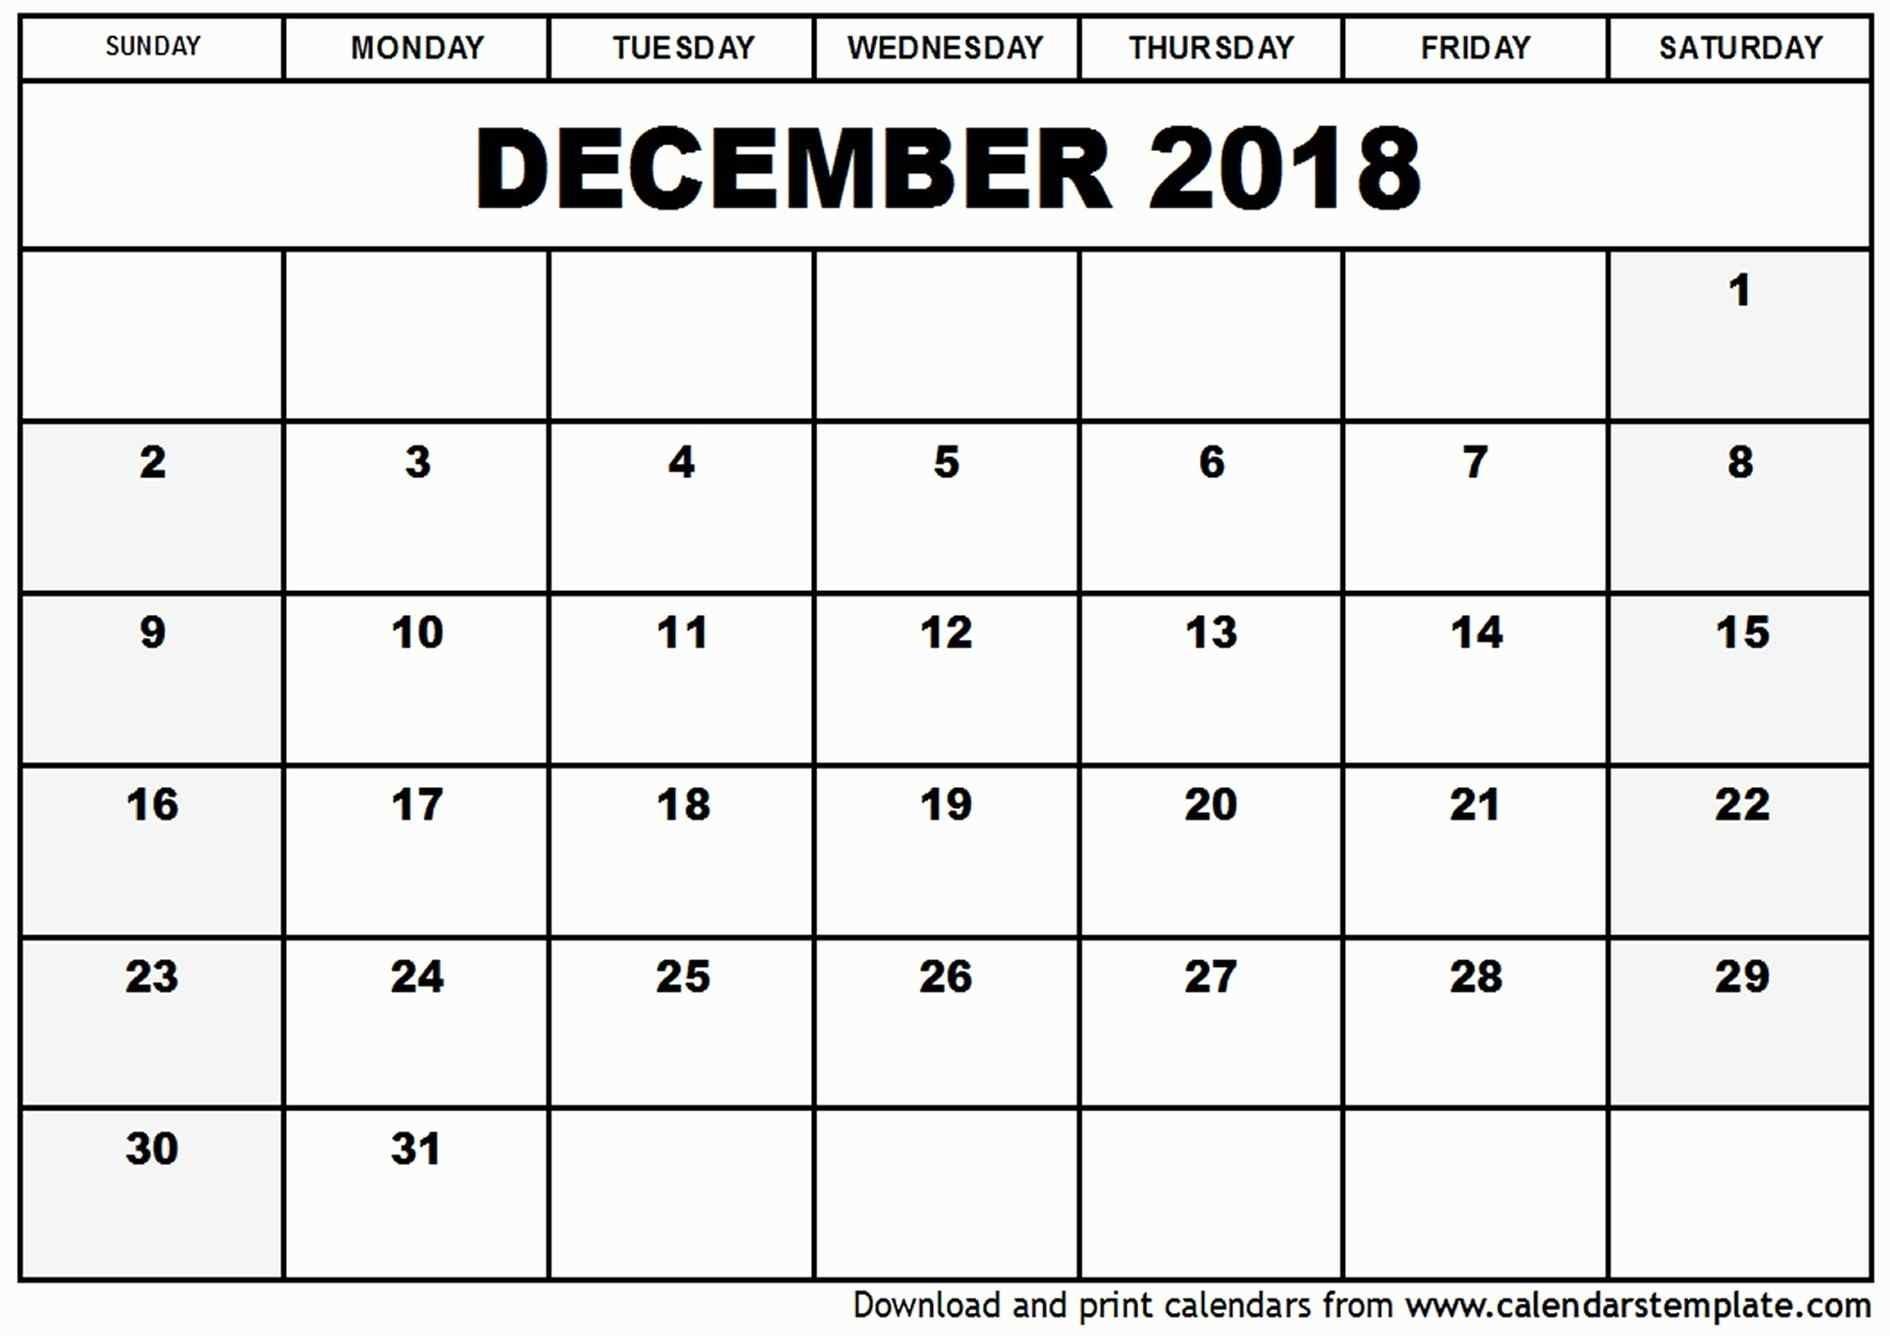 Desktop Calendar Templates Luxury Printable Calendar Feb 2019 – the Best Creative Template Design